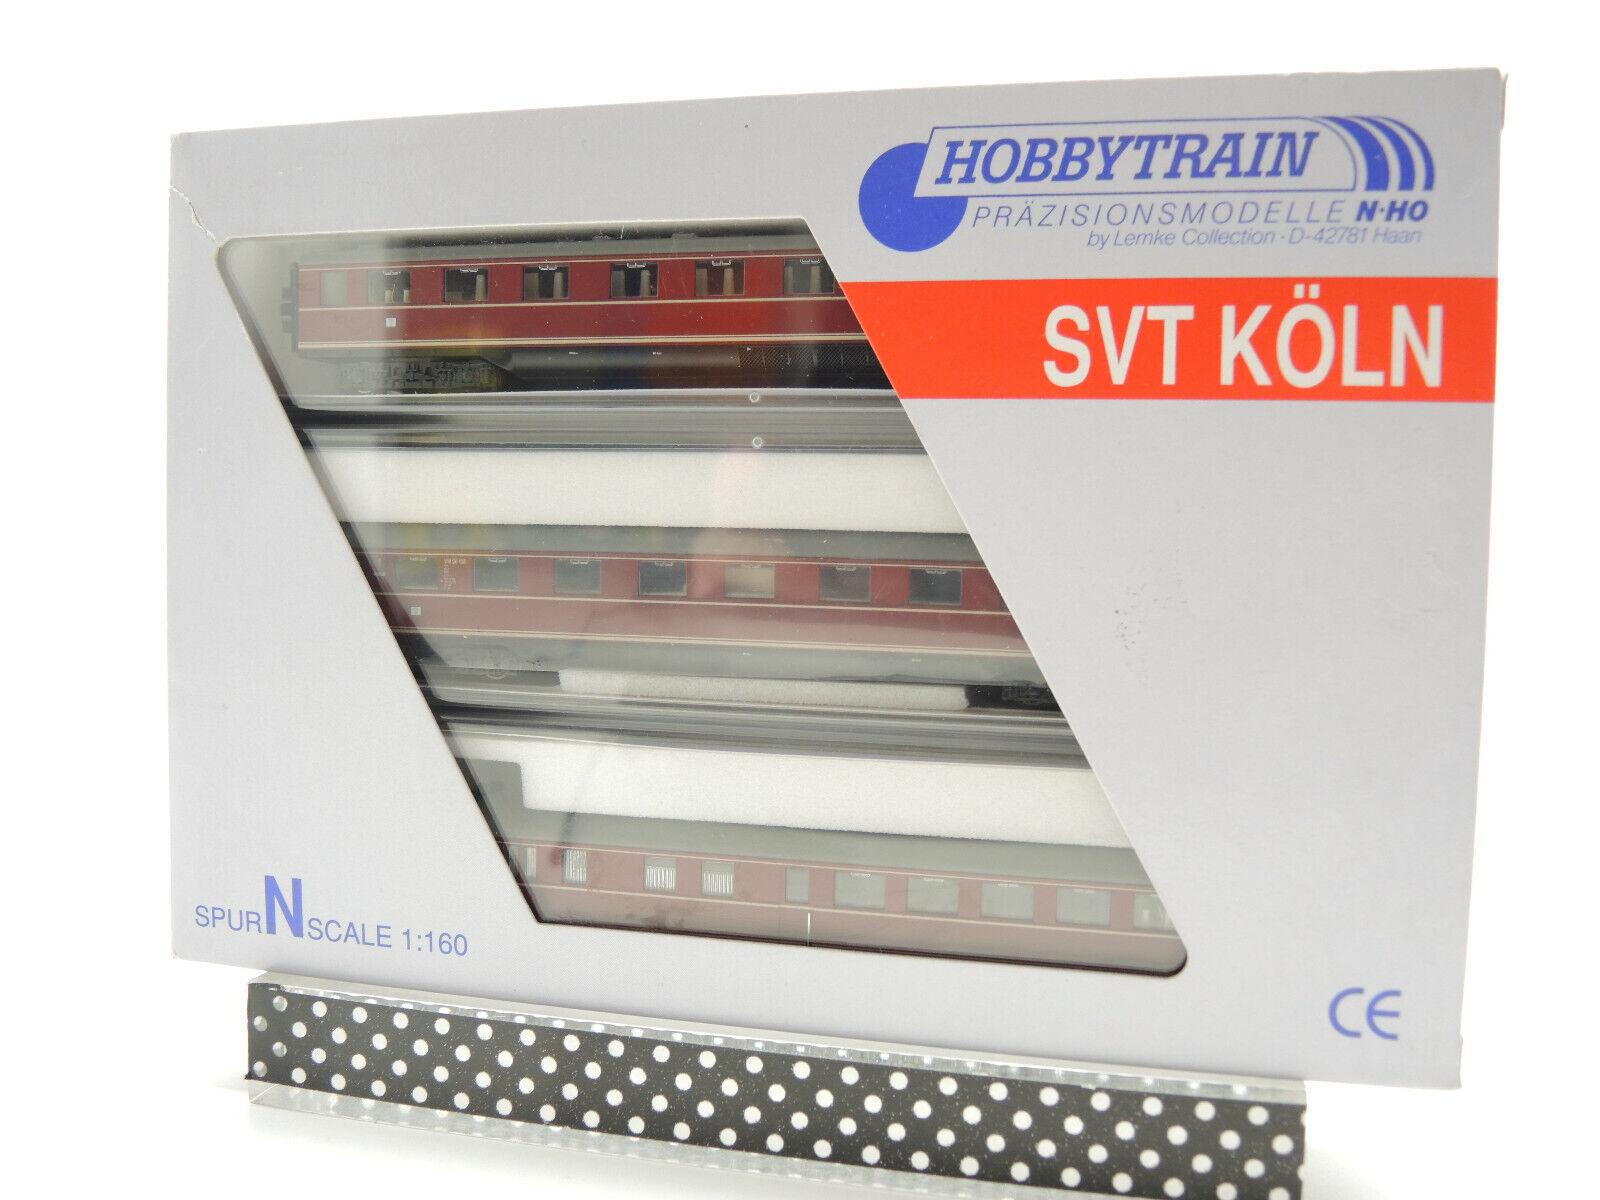 Hobby Train H11102  Triebwagen, SVT Köln VT06 der DB Ep.III, 3-teilig, TOP   OVP    Einzigartig